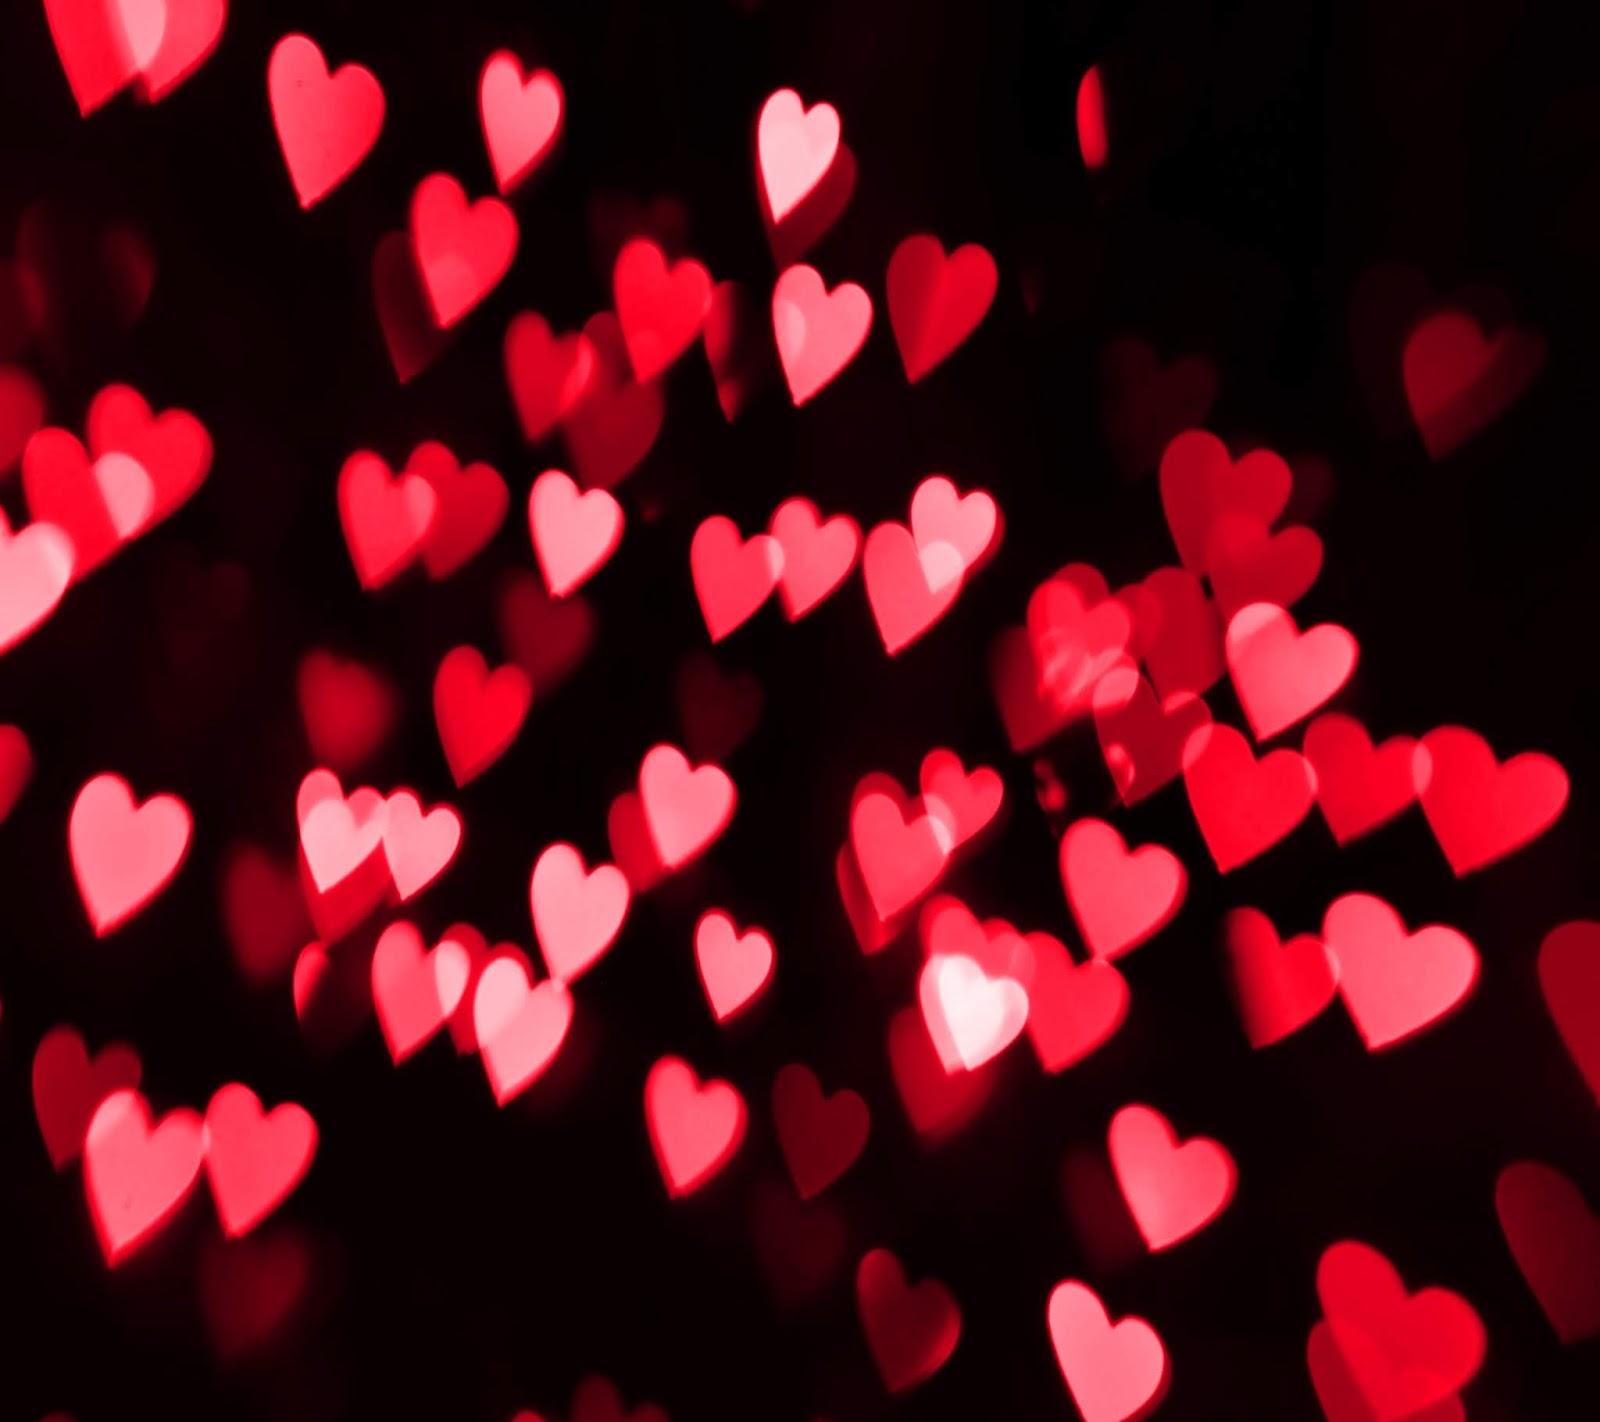 happy valentines day wallpaper